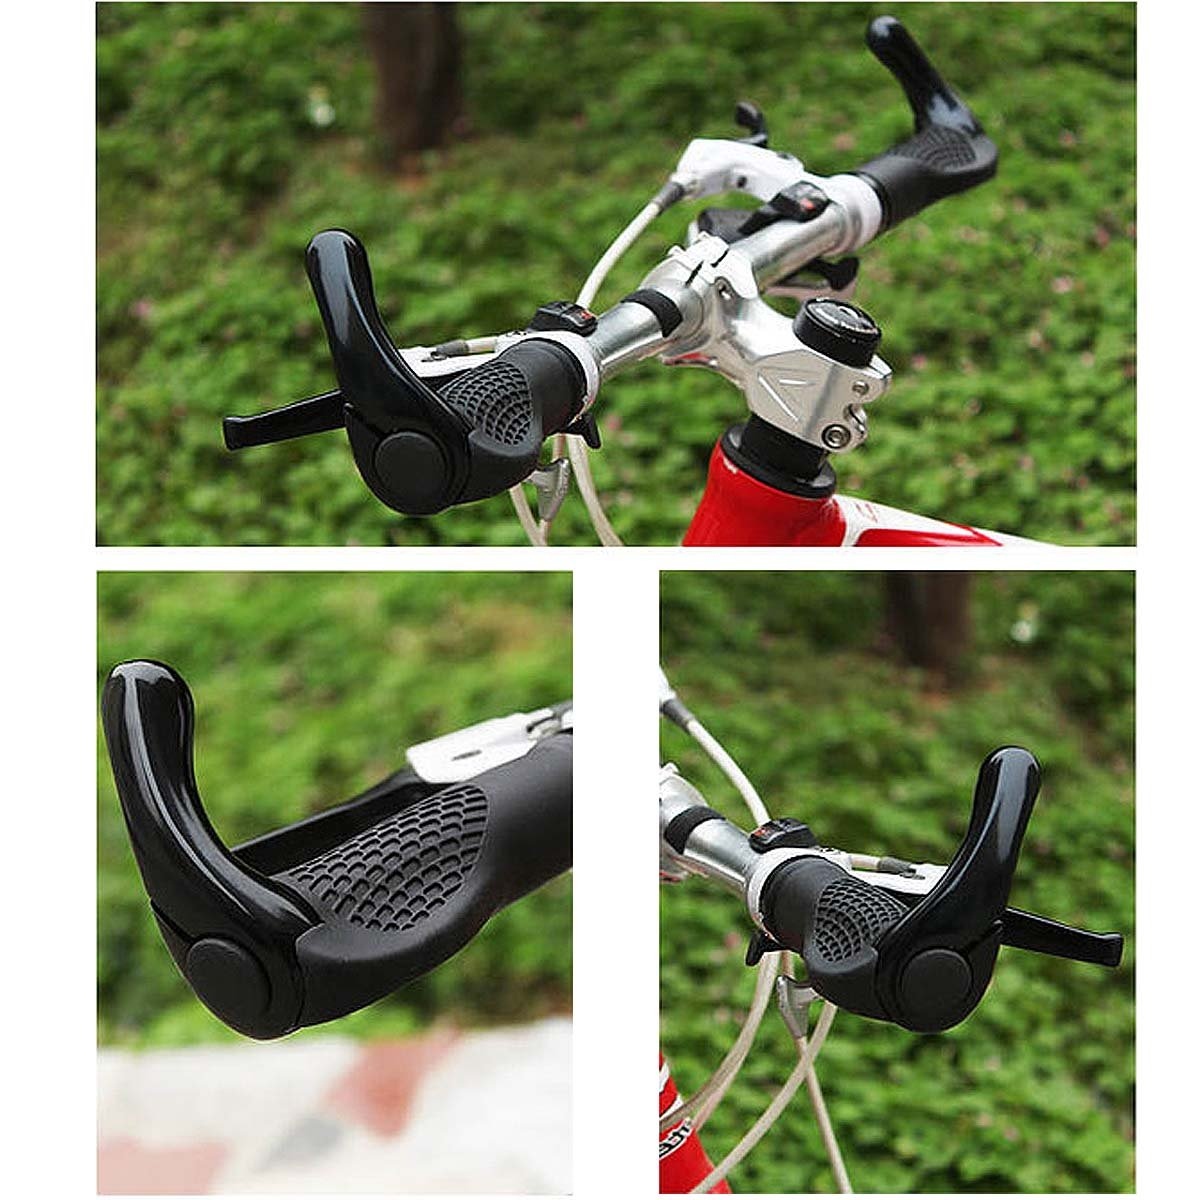 Kenthia Anti-slip Rubber Aluminum Alloy Bicycle Handlebar Grips Human Mechanics Design Blue by Kenthia (Image #4)